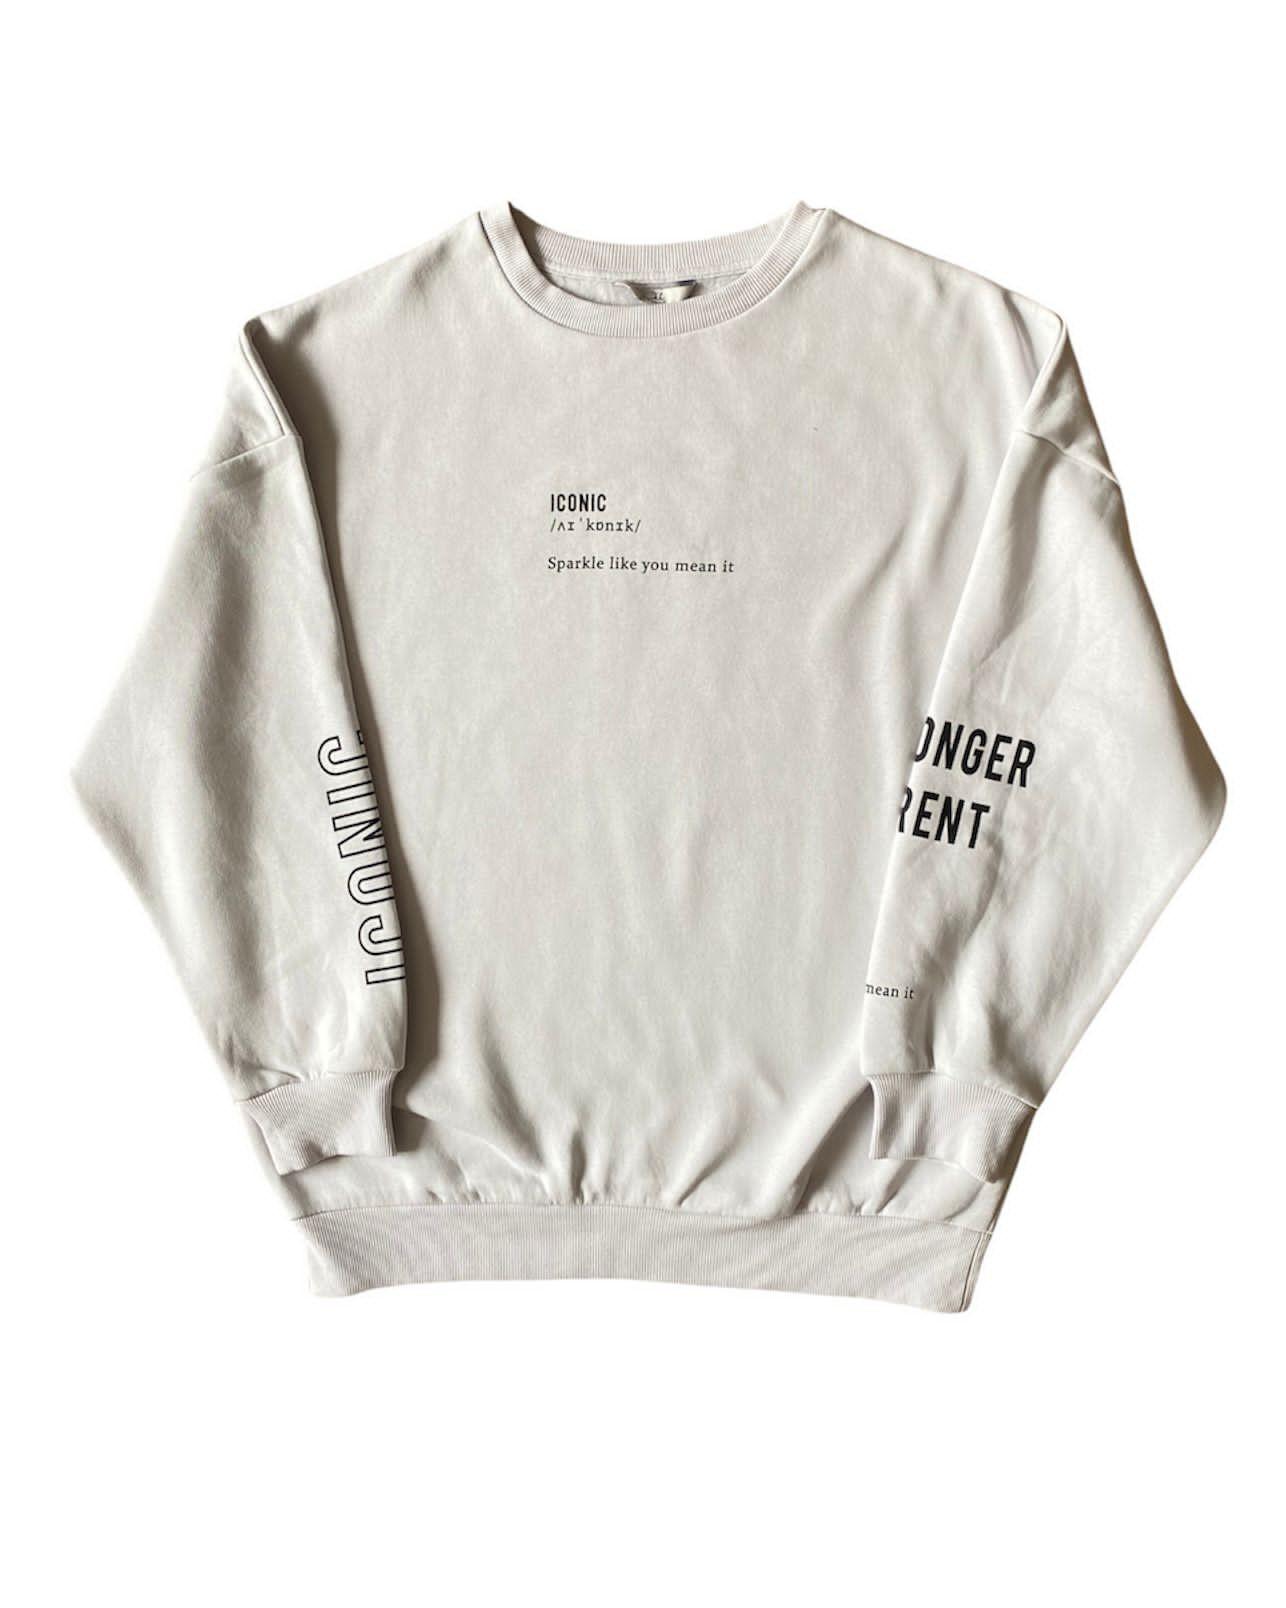 Clock House Iconic Sweatshirt (SCL1)